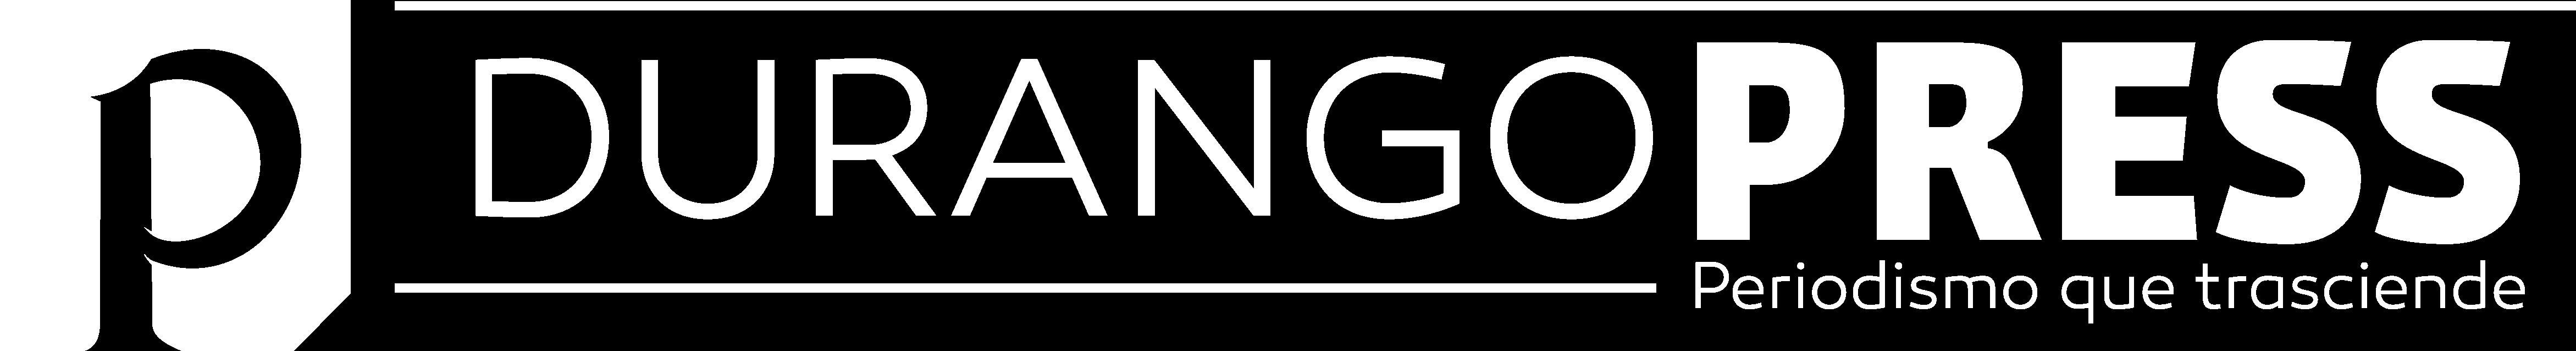 Durango Press